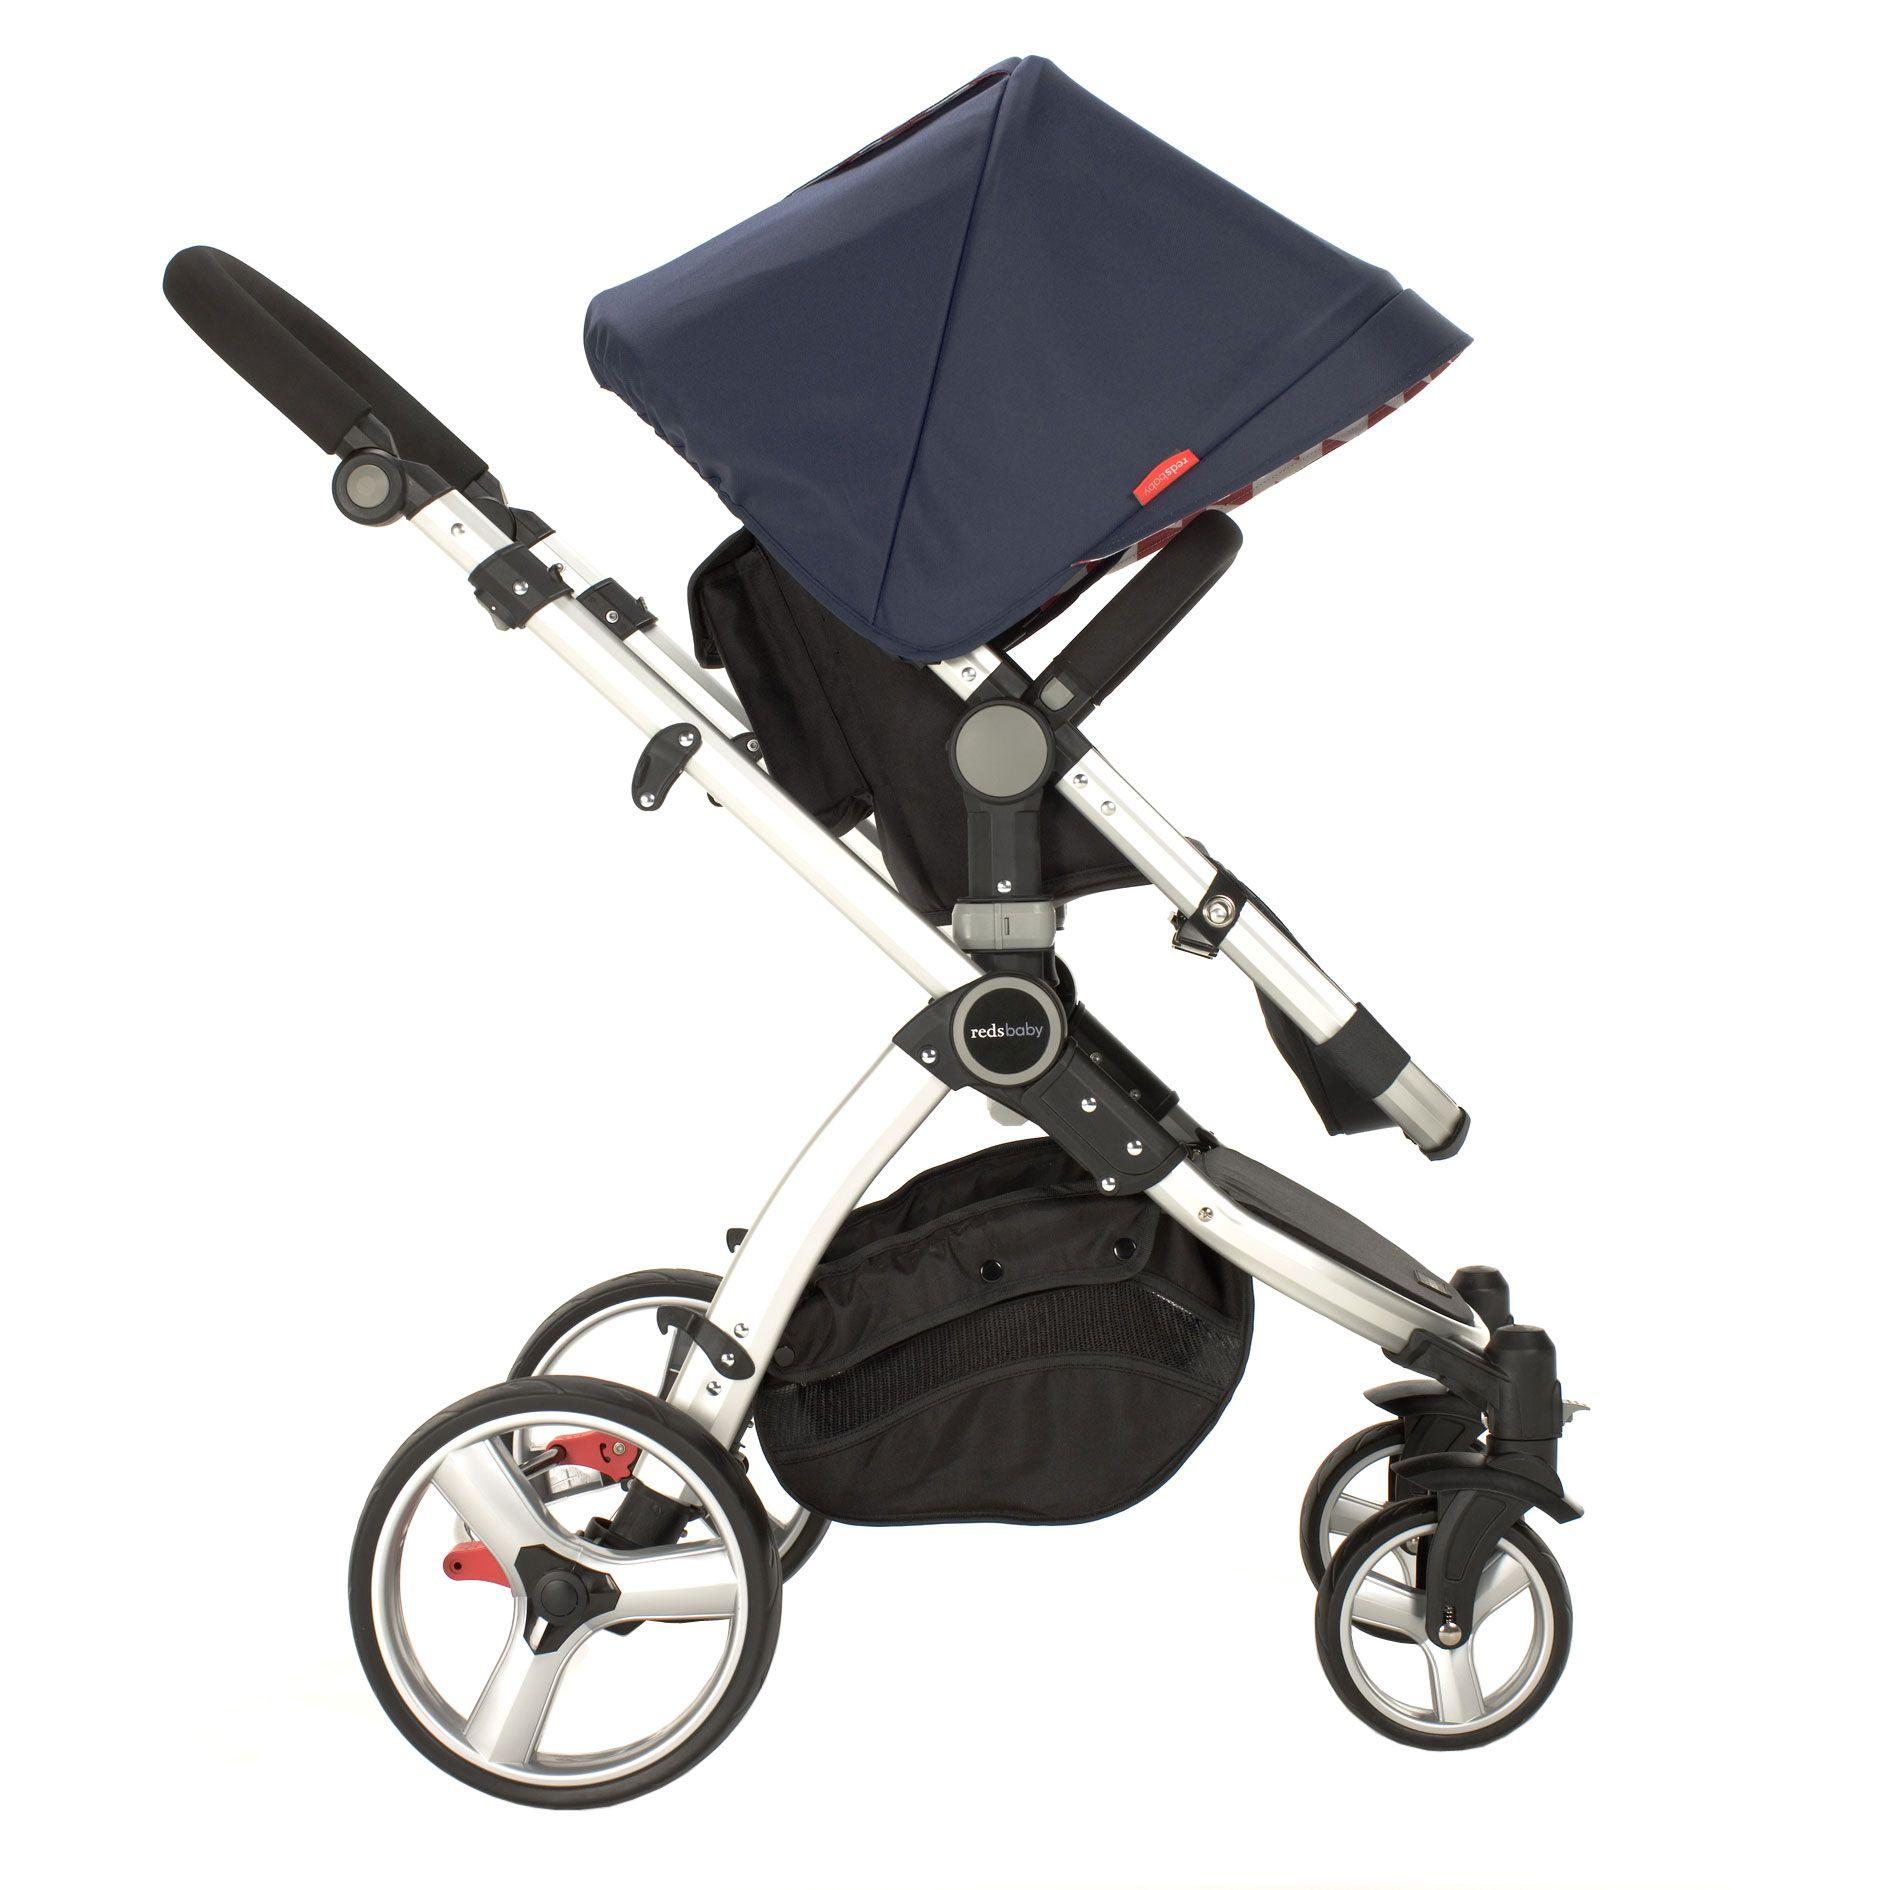 Redsbaby Bounce The Utlimate AllInOne Stroller/ Pram